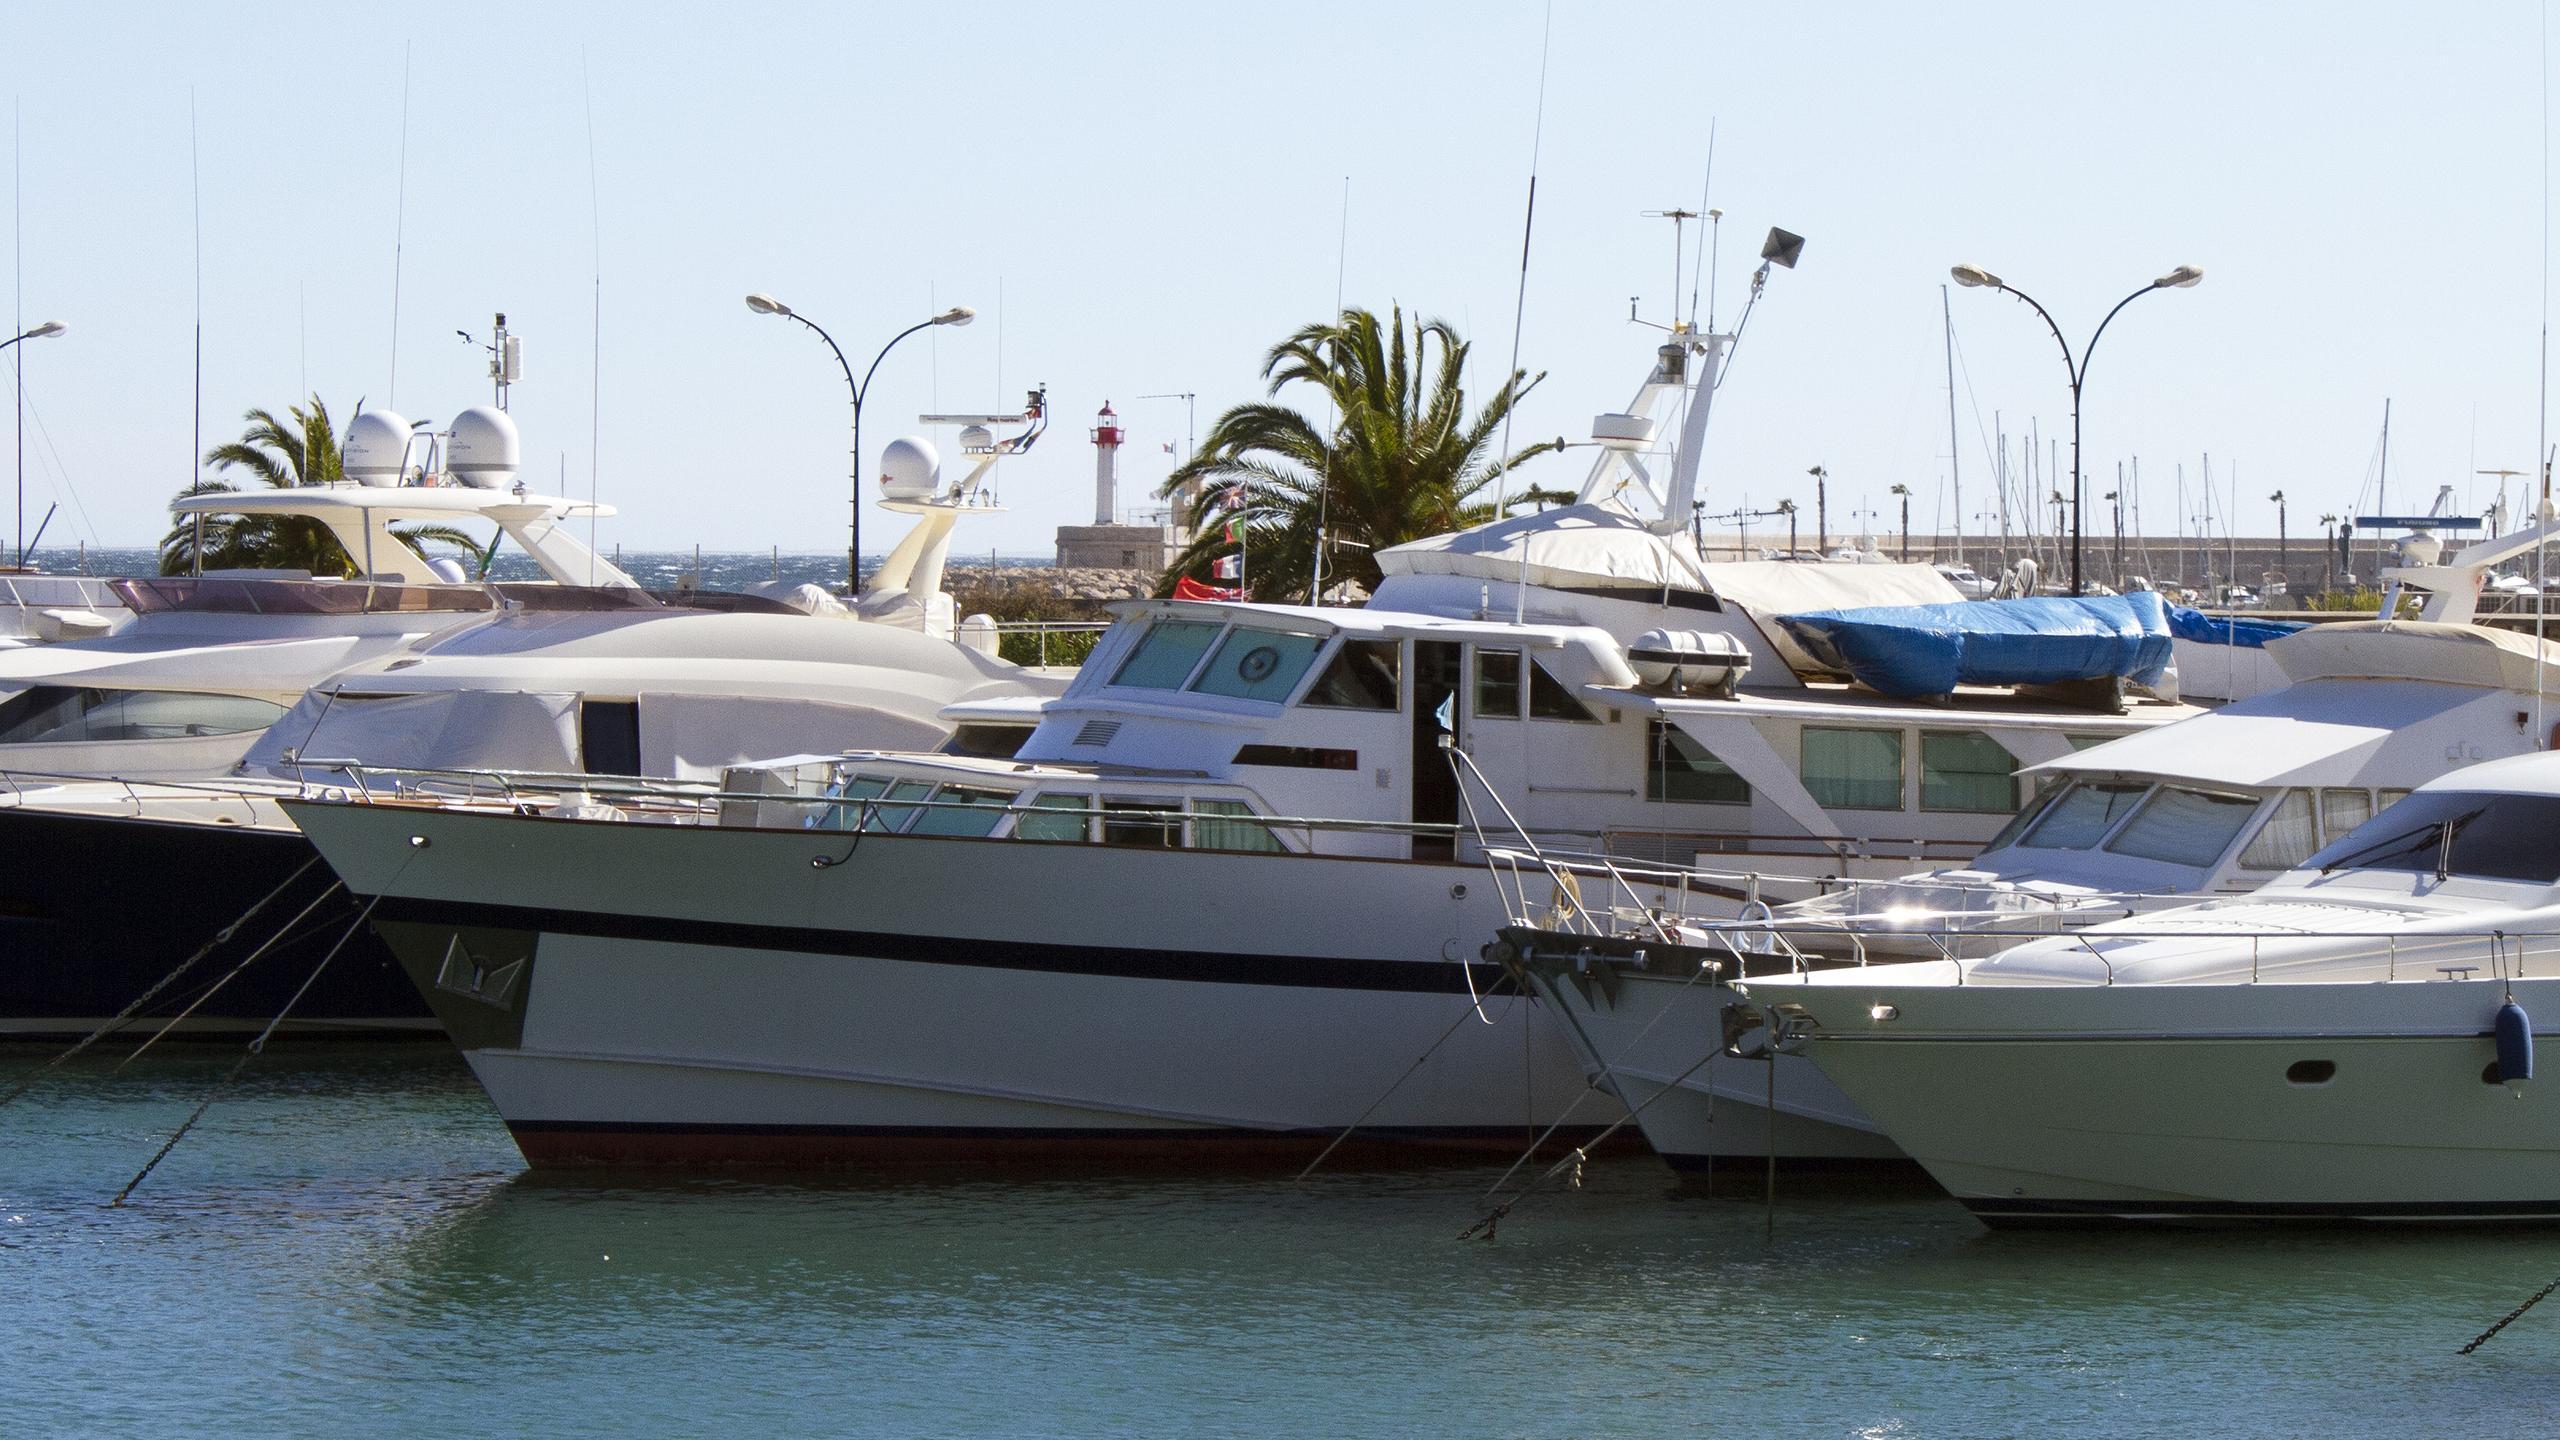 queen-v-motor-yacht-burmester-1970-26m-profile